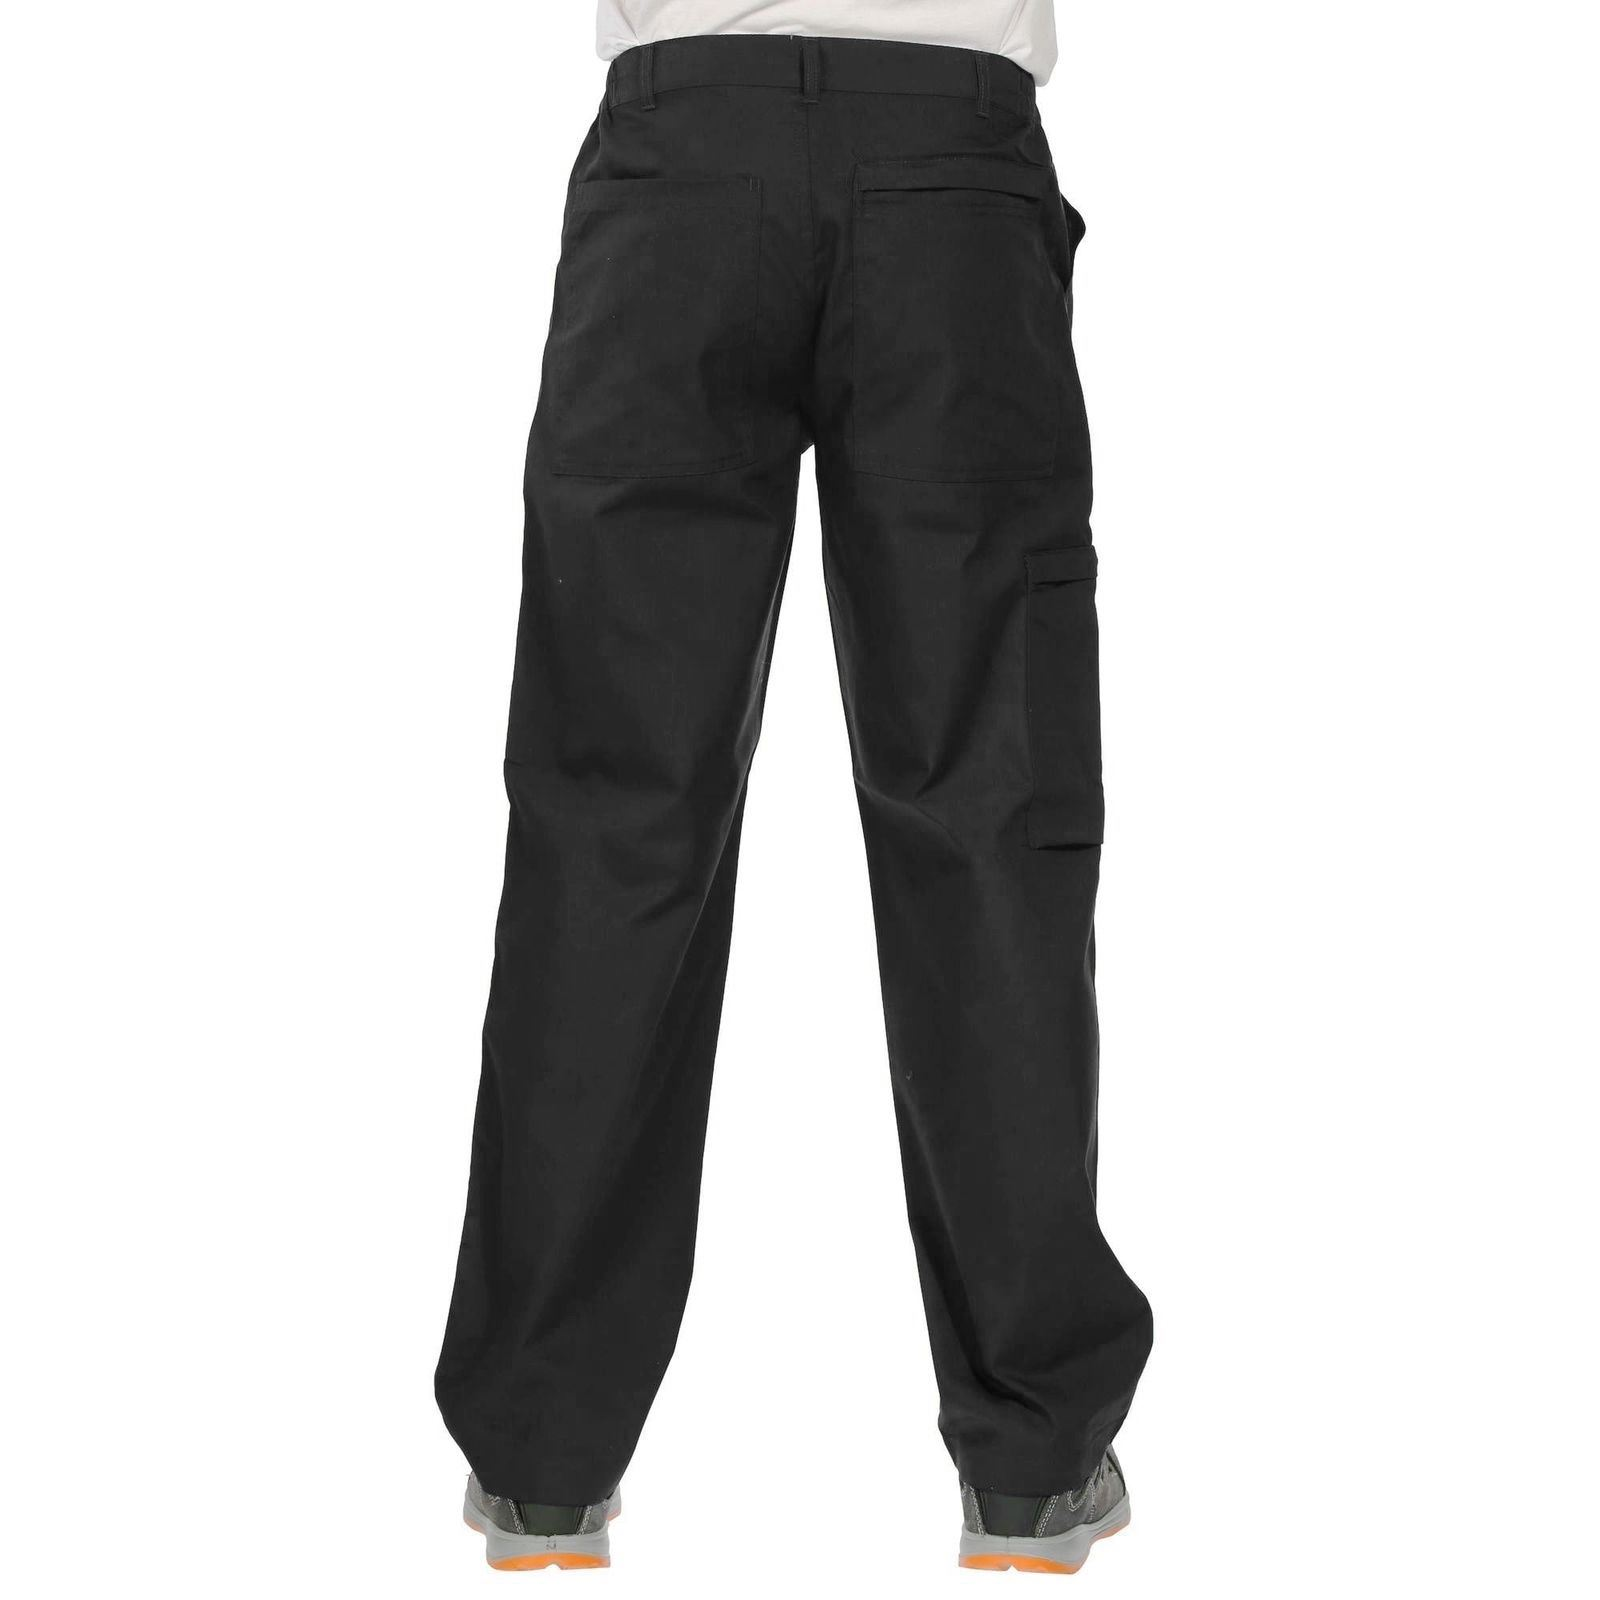 Mens Regatta Work Durable Action Combat Cargo Elasticated Trousers Size 30-42